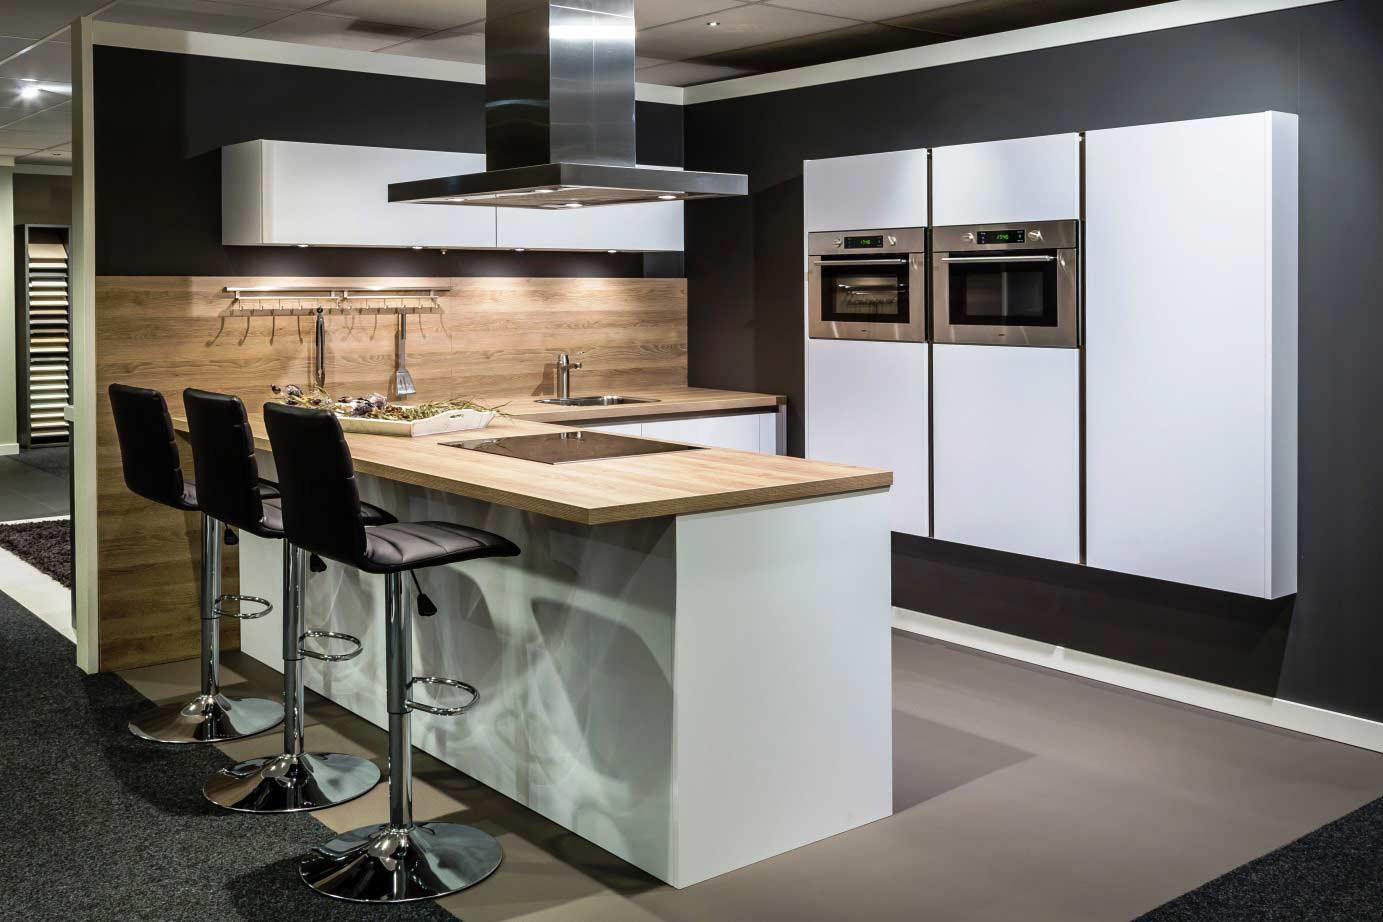 Goedkope Keuken Kastenwand : Greeploze keuken inclusief kastenwand. – DB Keukens